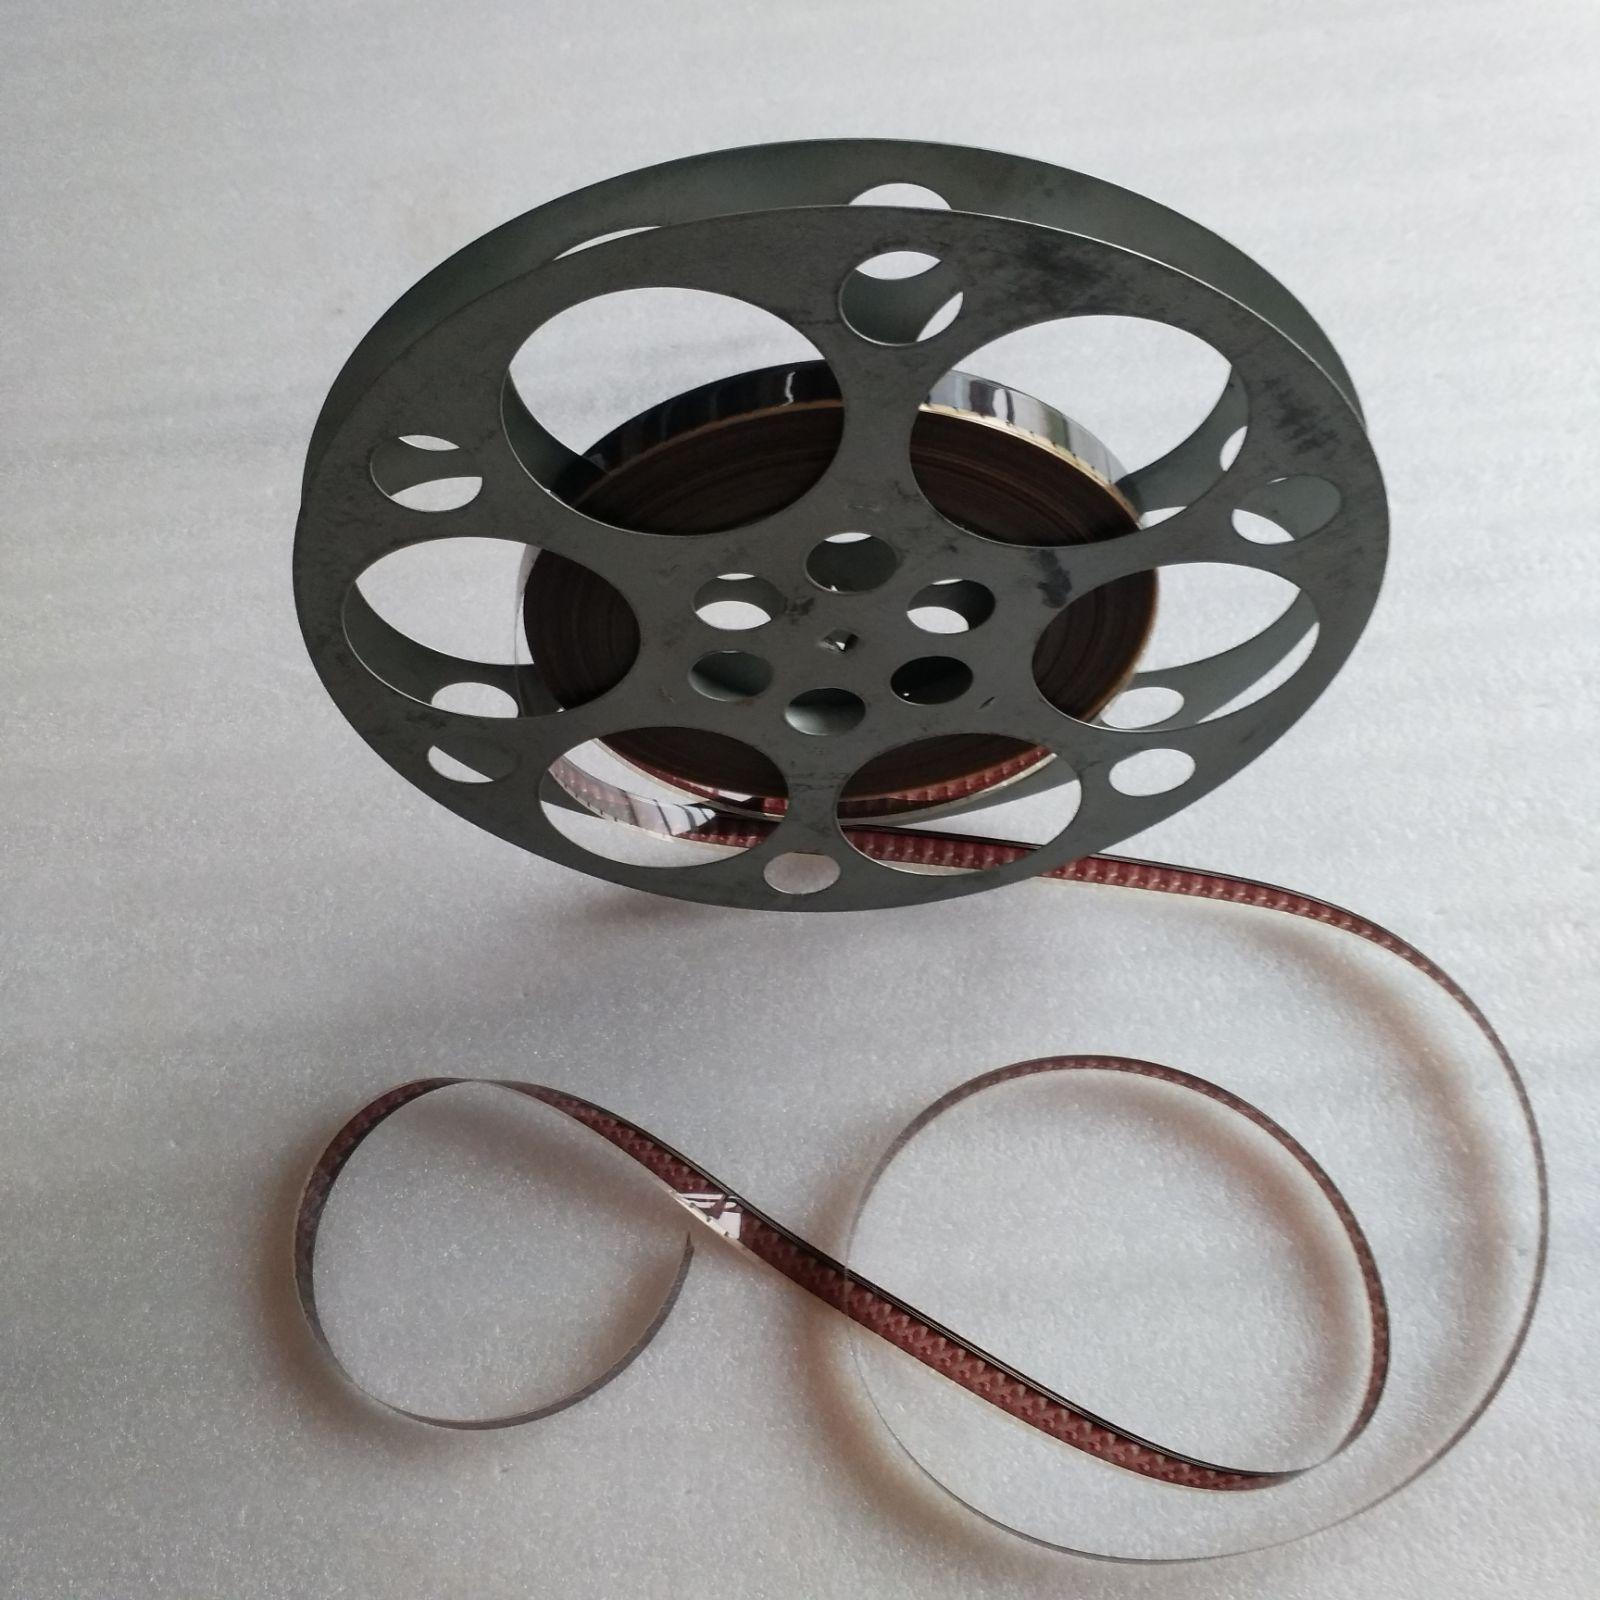 16mm film negatives Film copy Film projector film armor clip plate Film and television props decorative nostalgia